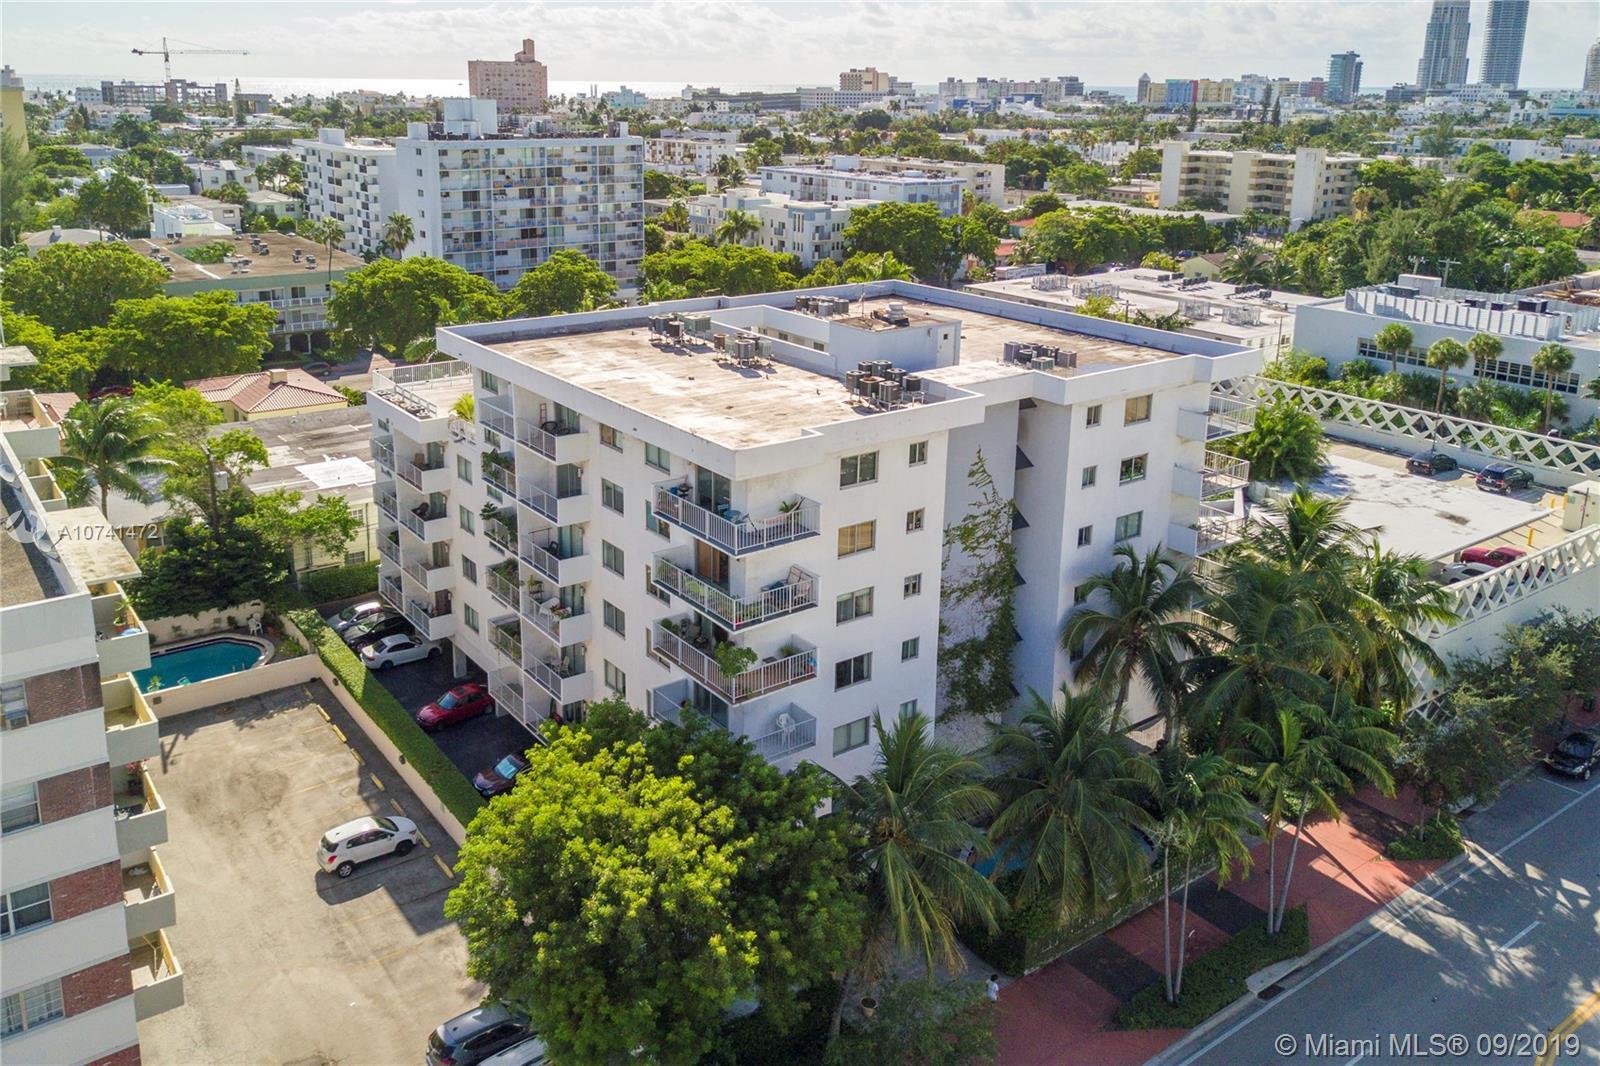 1025 Alton Rd, 302 - Miami Beach, Florida